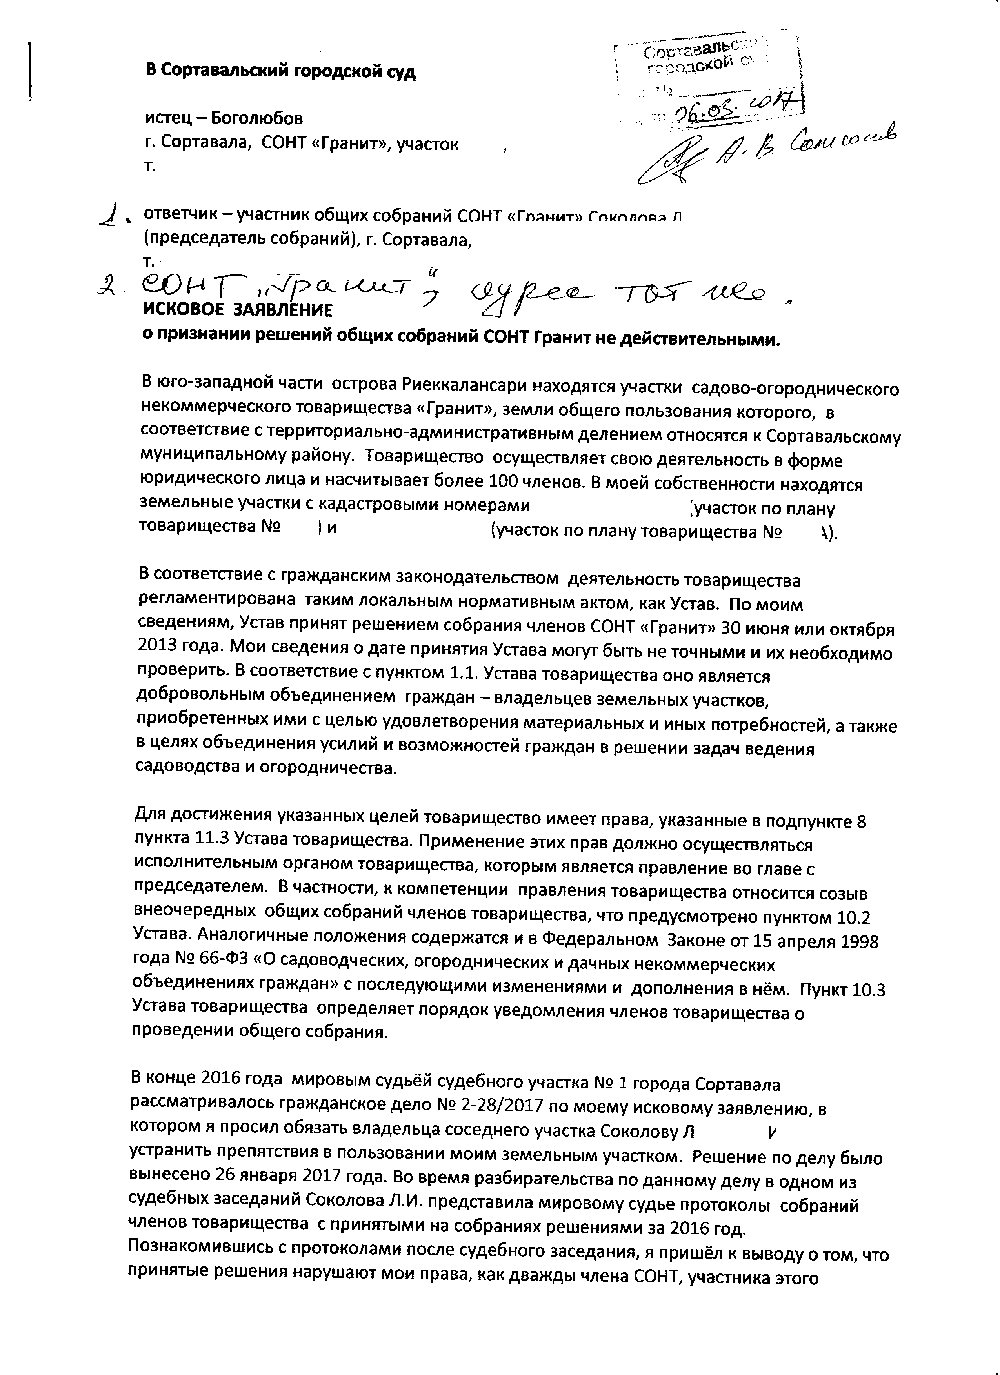 https://sontgranit.ru/forum/img/sokol/скан-иска-01.png